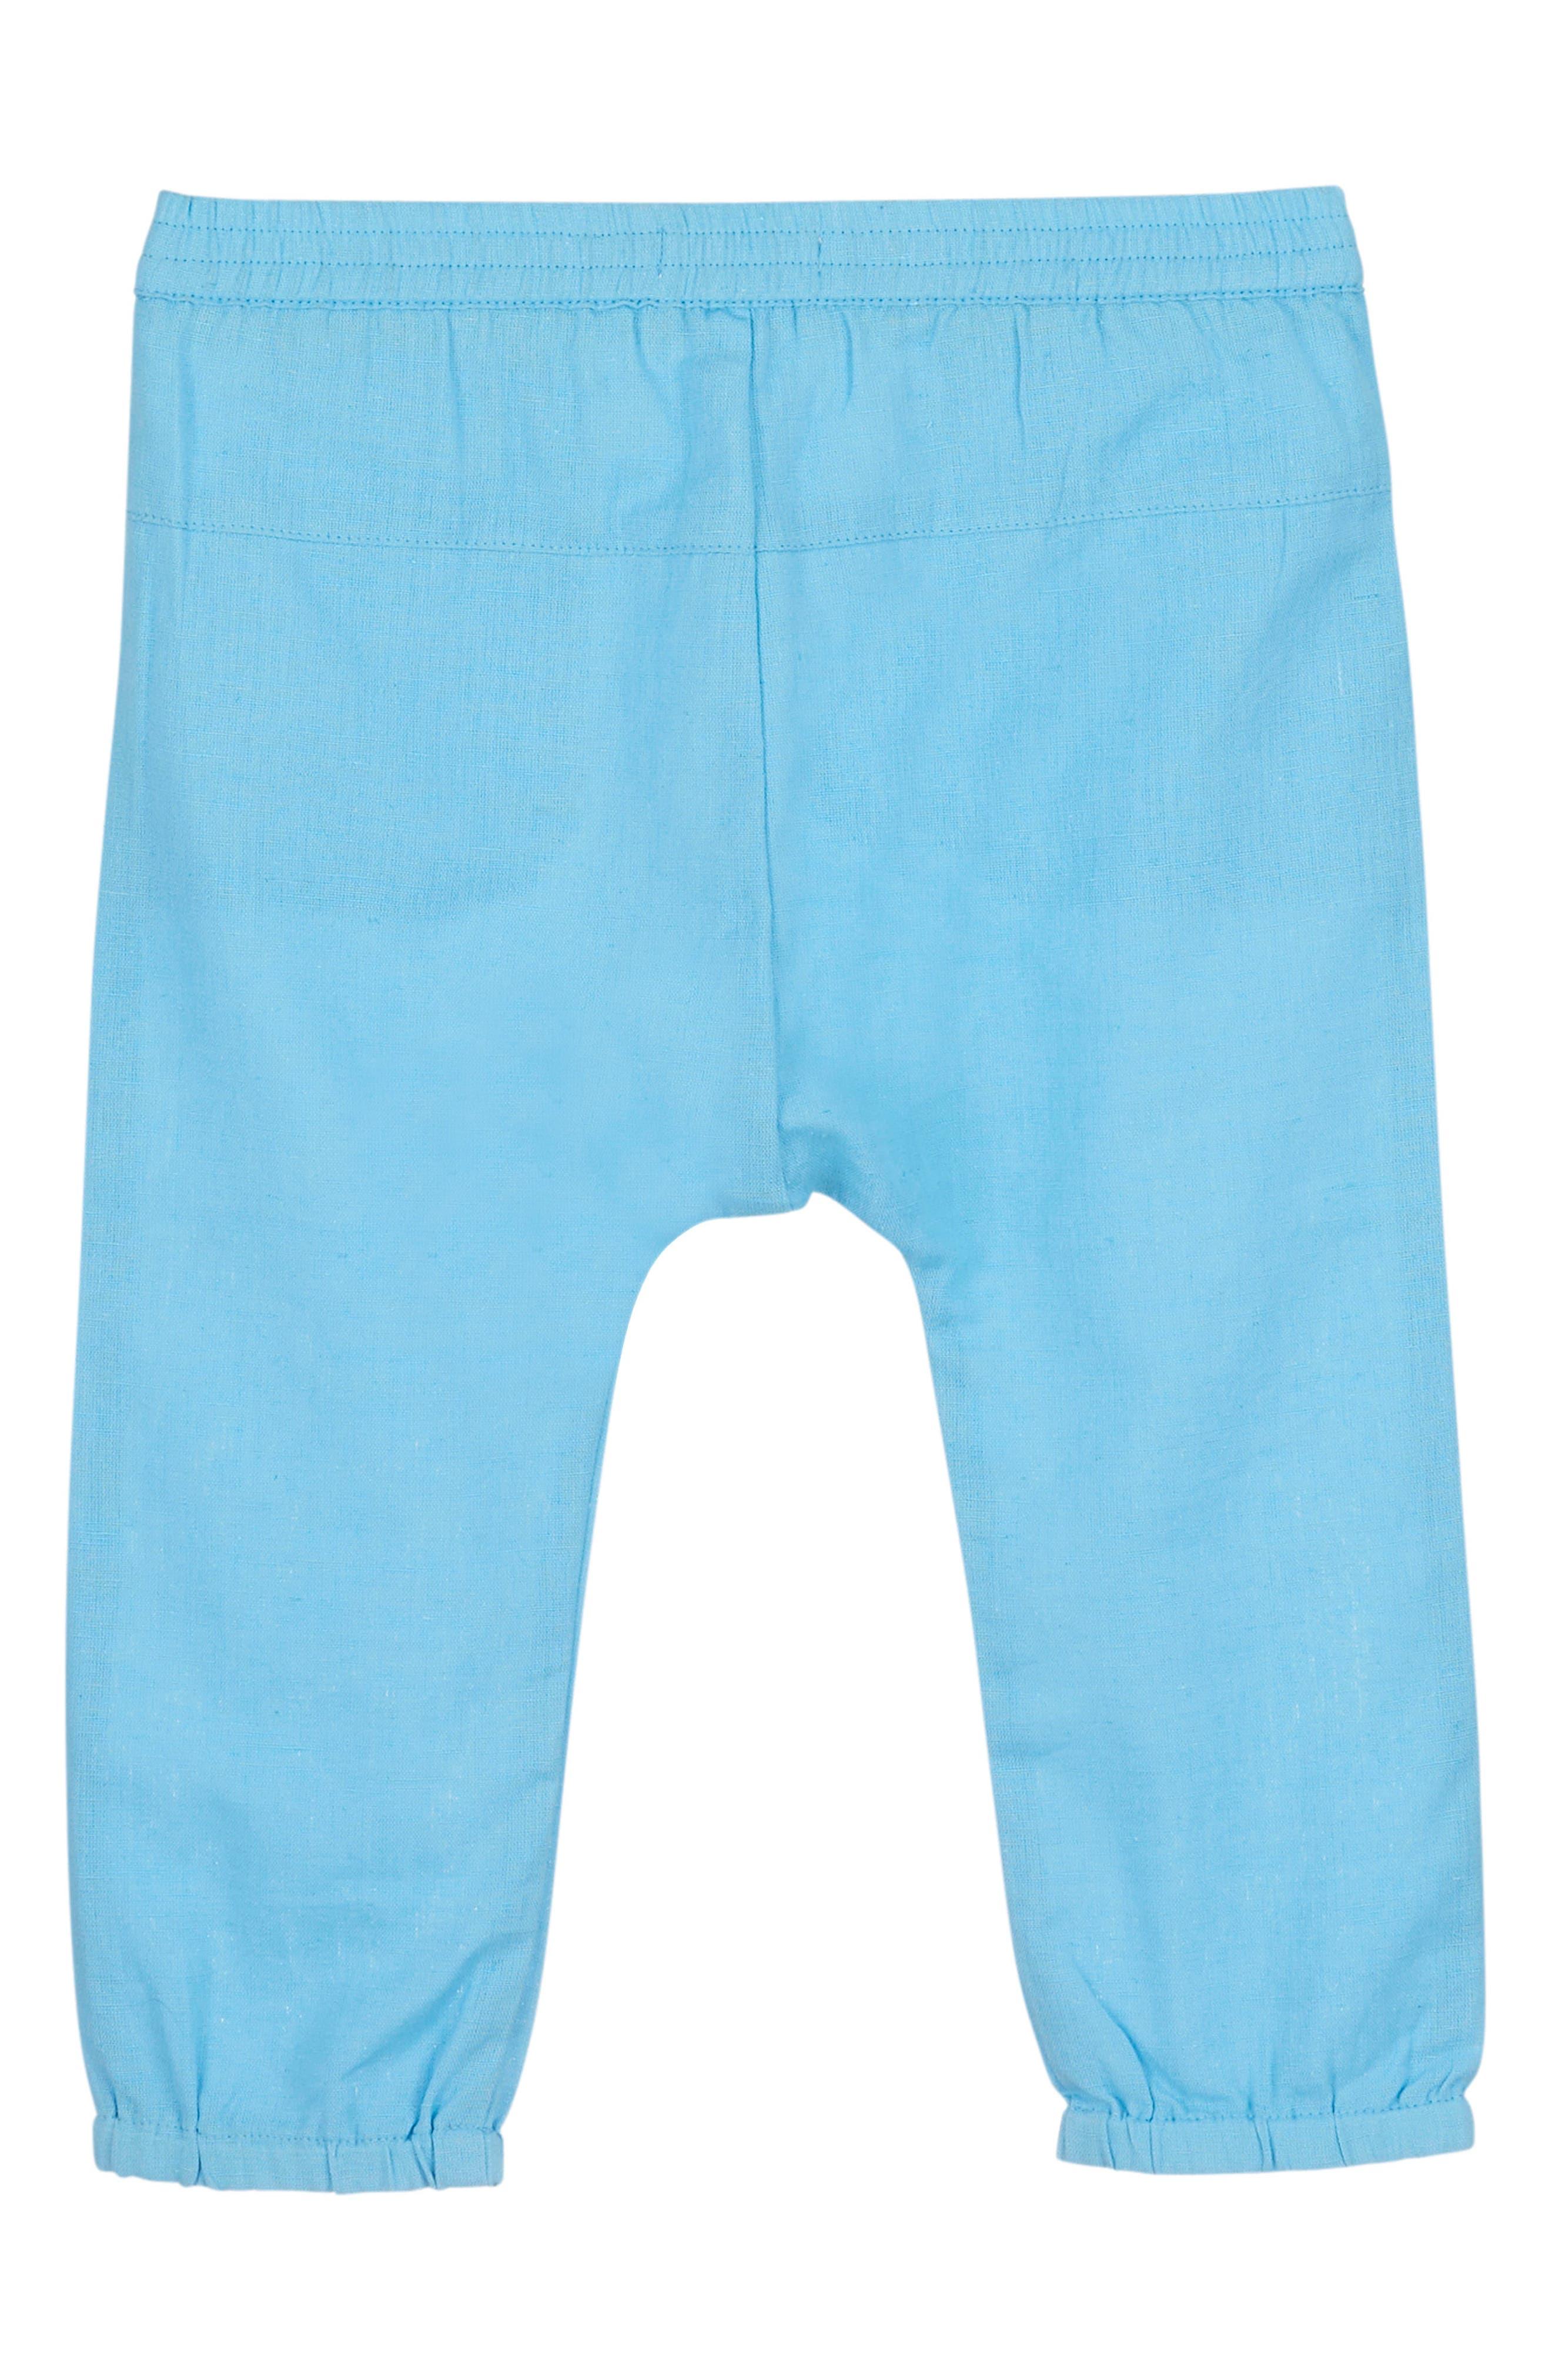 Harem Pants,                             Main thumbnail 1, color,                             420